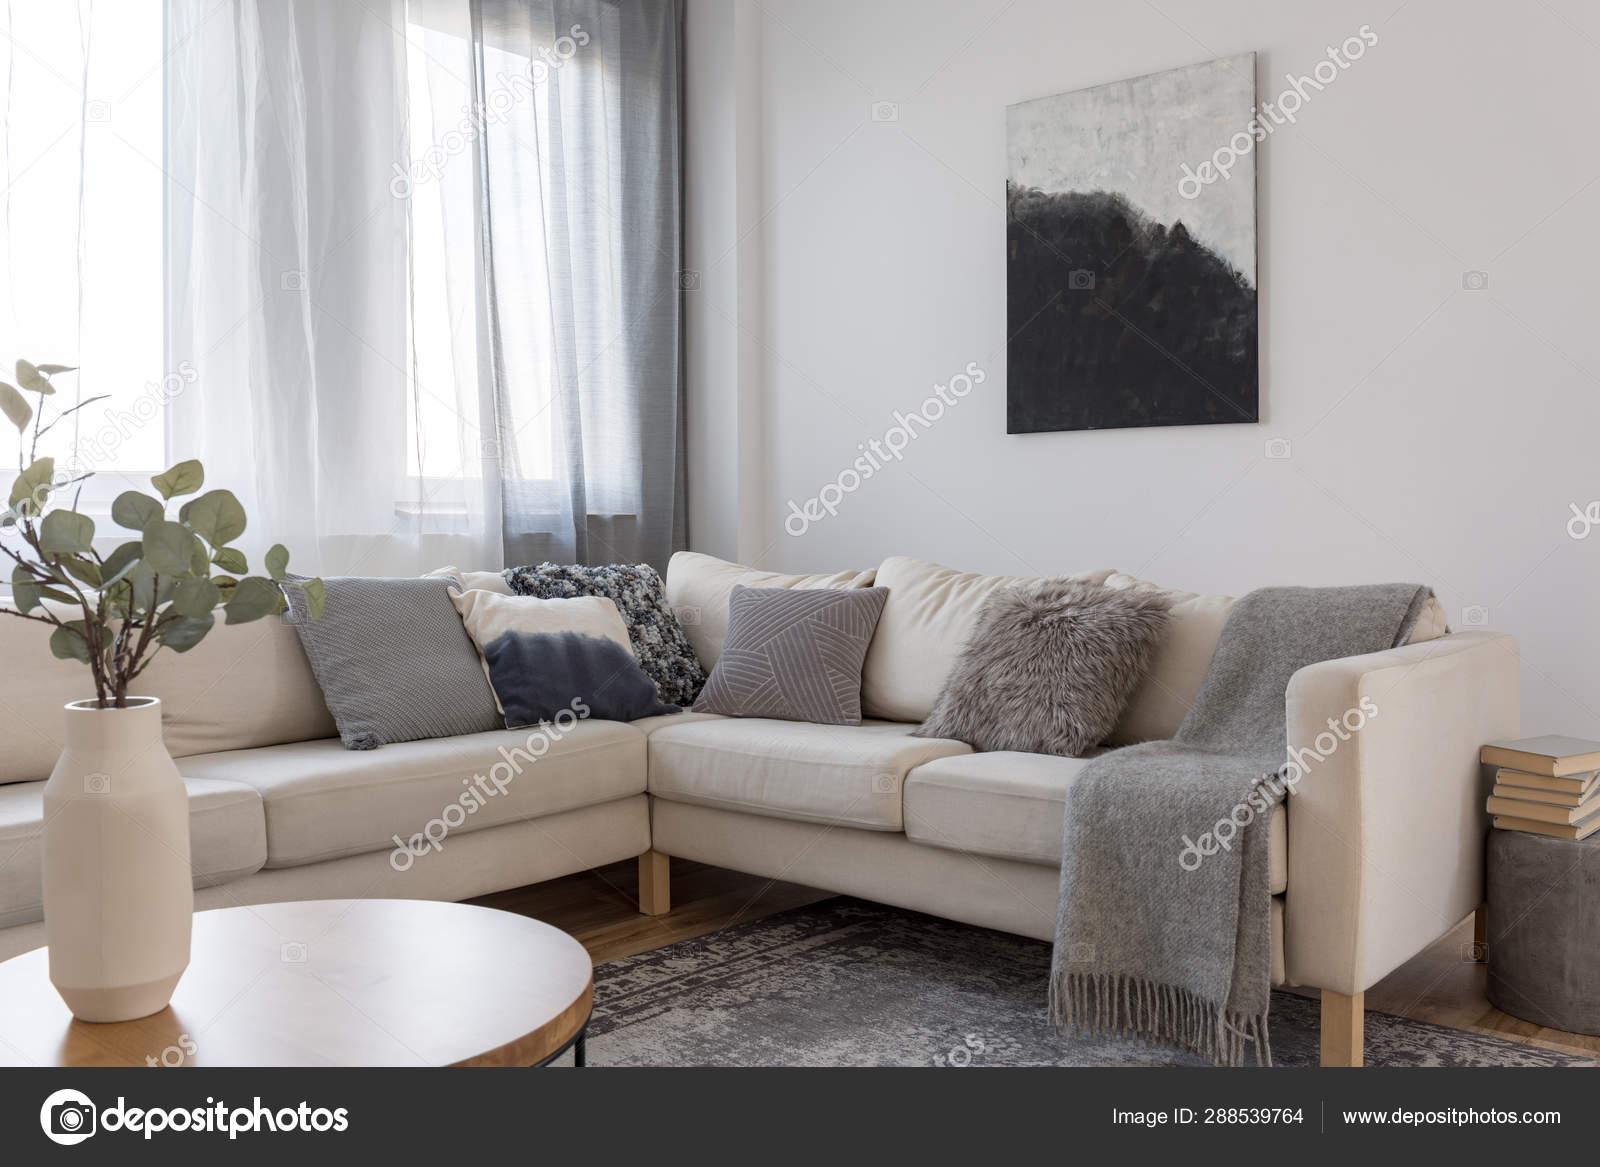 Beige Comfortable Corner Sofa With Grey Pillows In Elegant